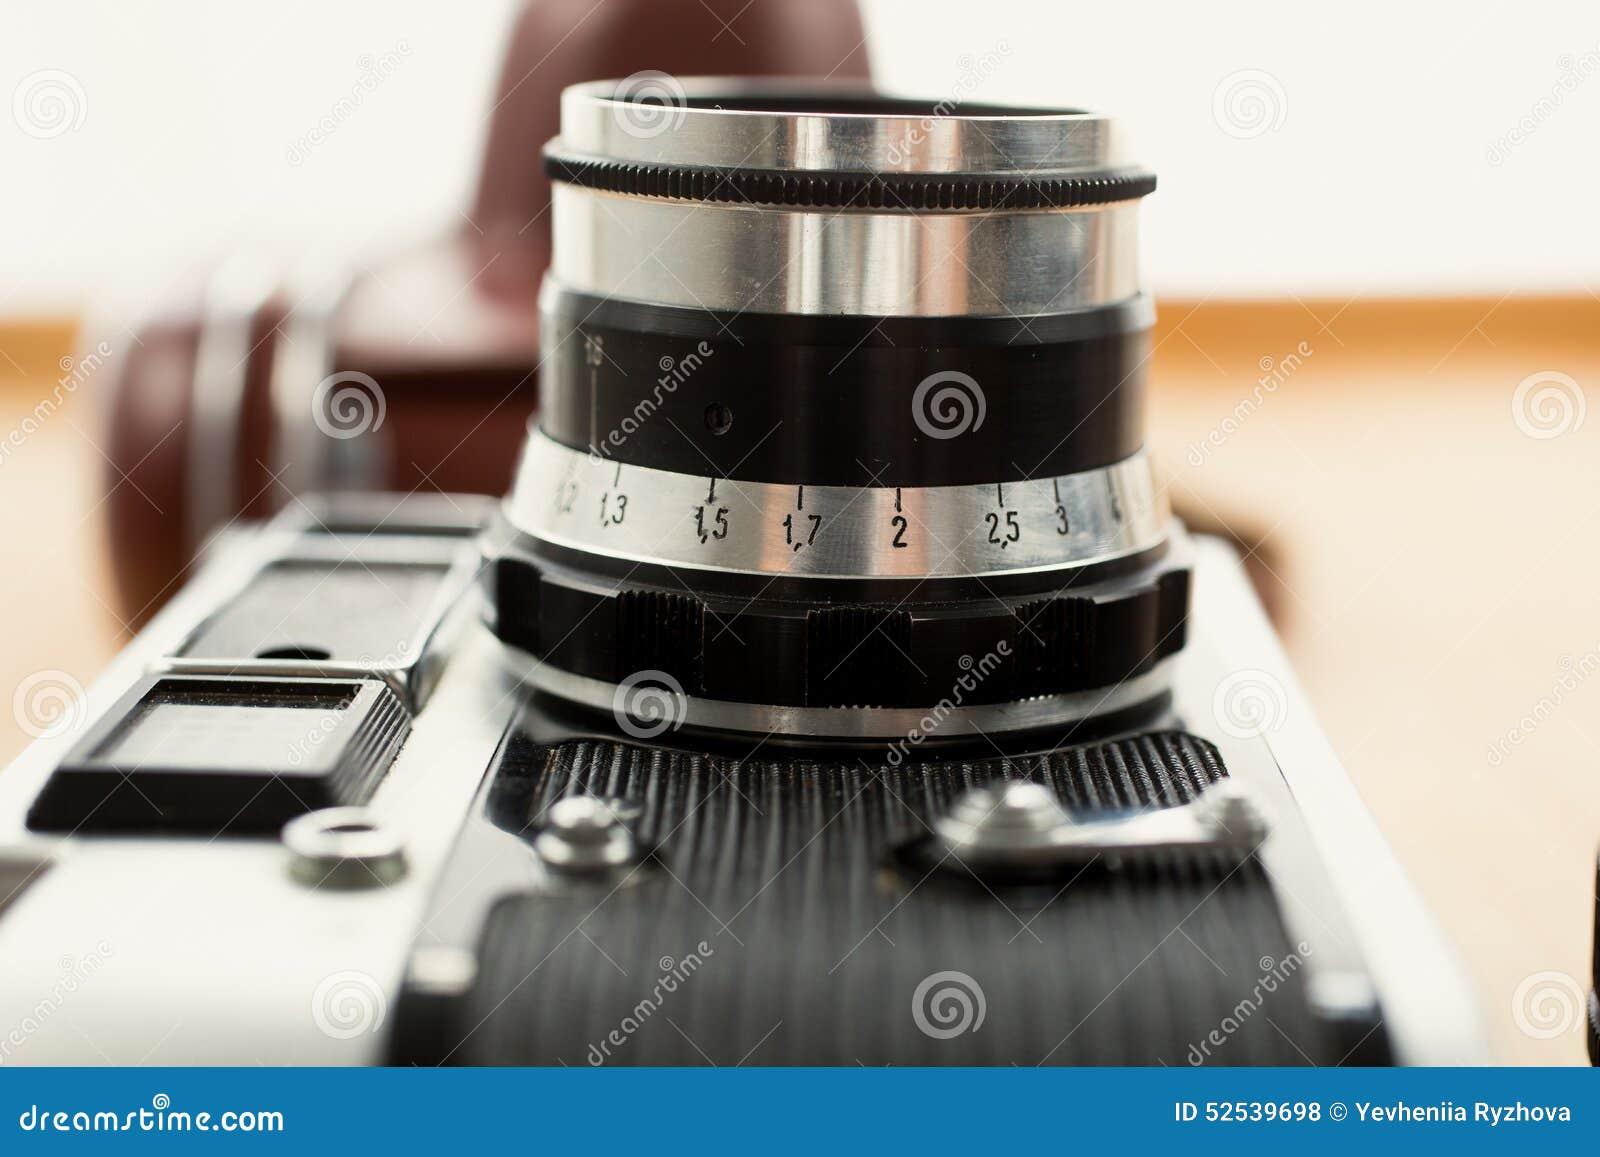 Closeup photo of vintage camera lying on wooden desk